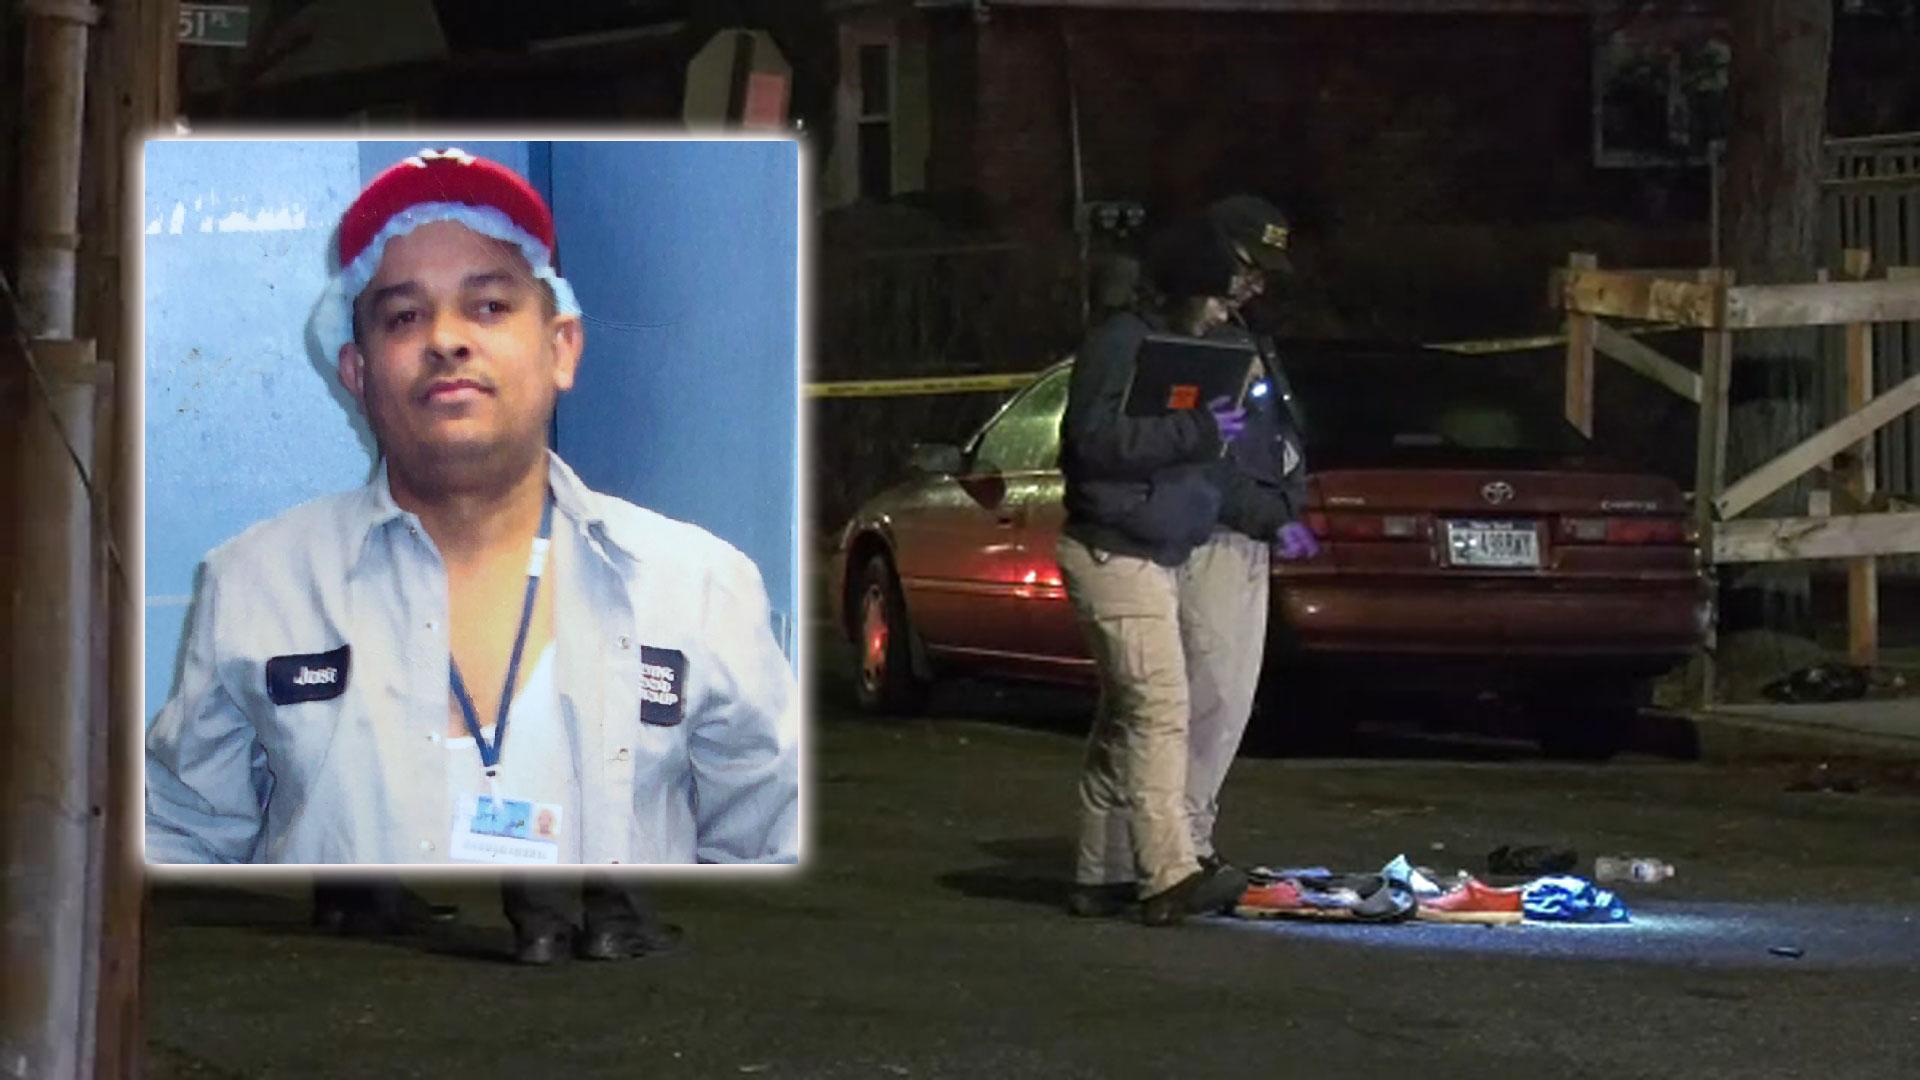 5896712 020120 wabc queens fatal stabbing victim inset img - Cab Service In Springfield Gardens Queens